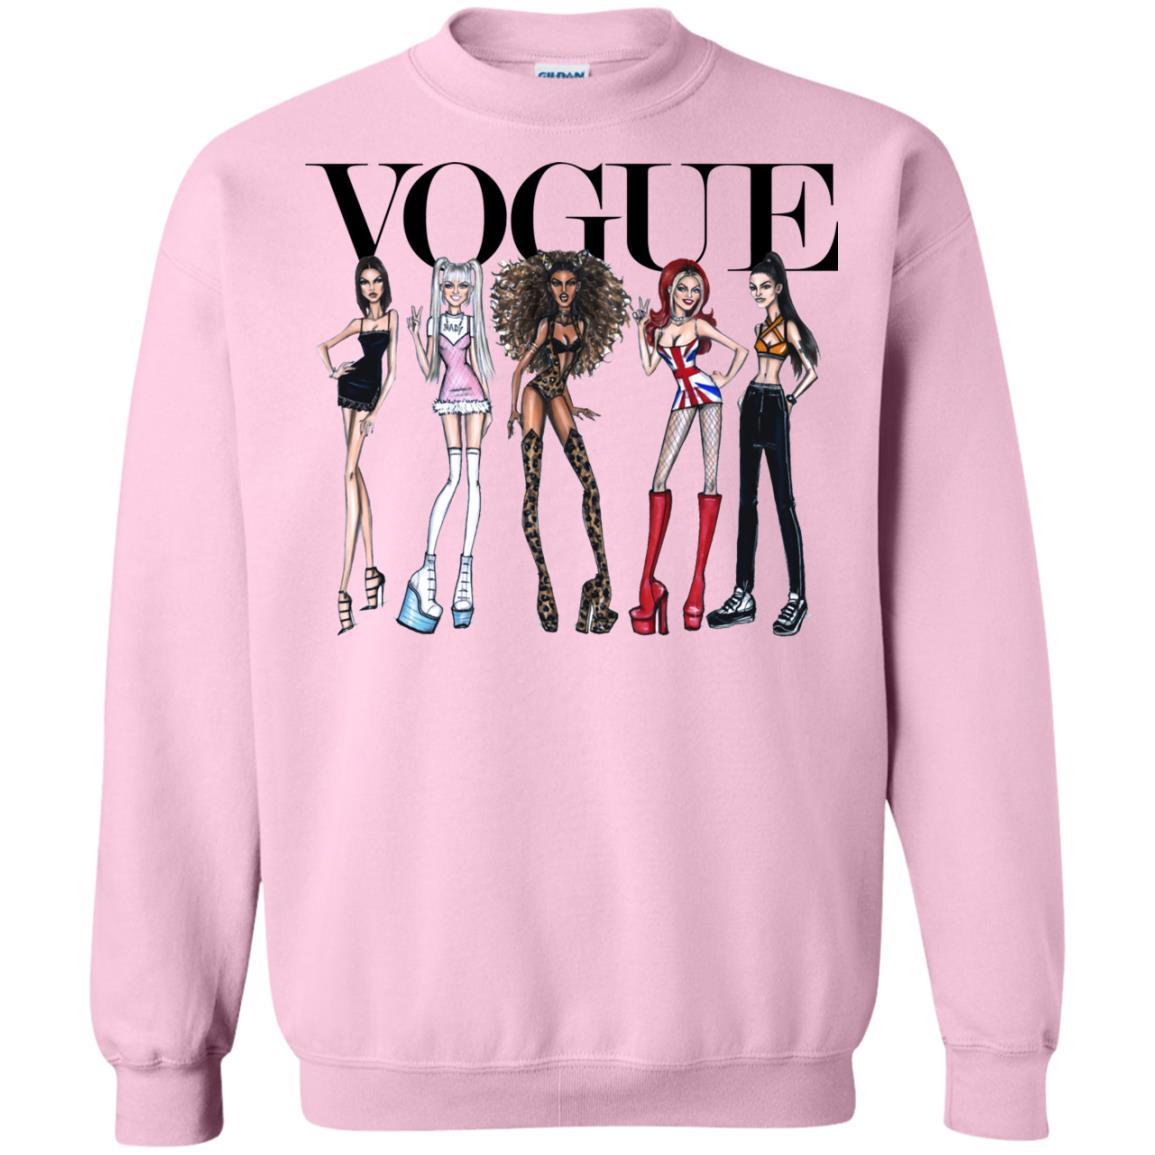 image 4435 - Spice Girls Vogue shirt, sweater